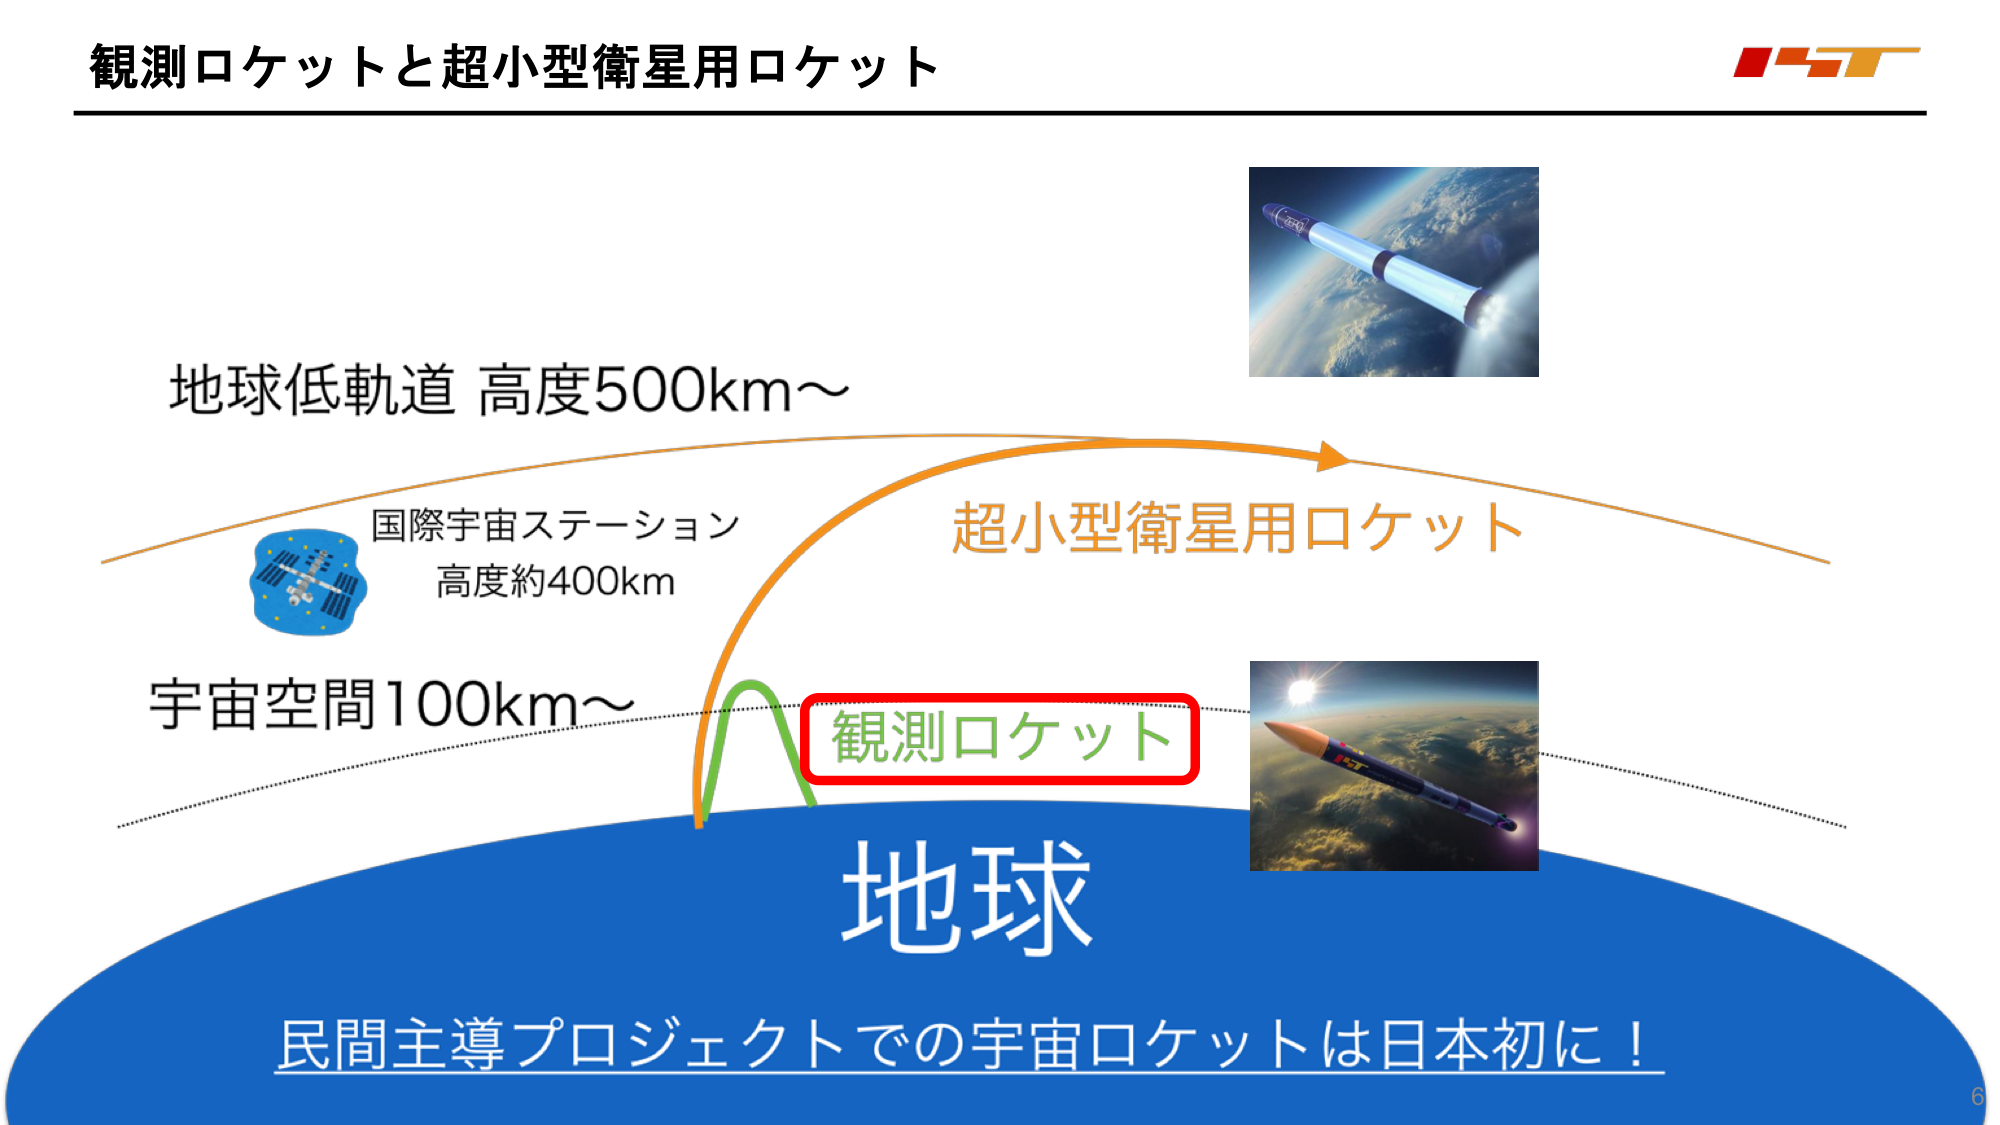 f:id:Imamura:20200603232734p:plain